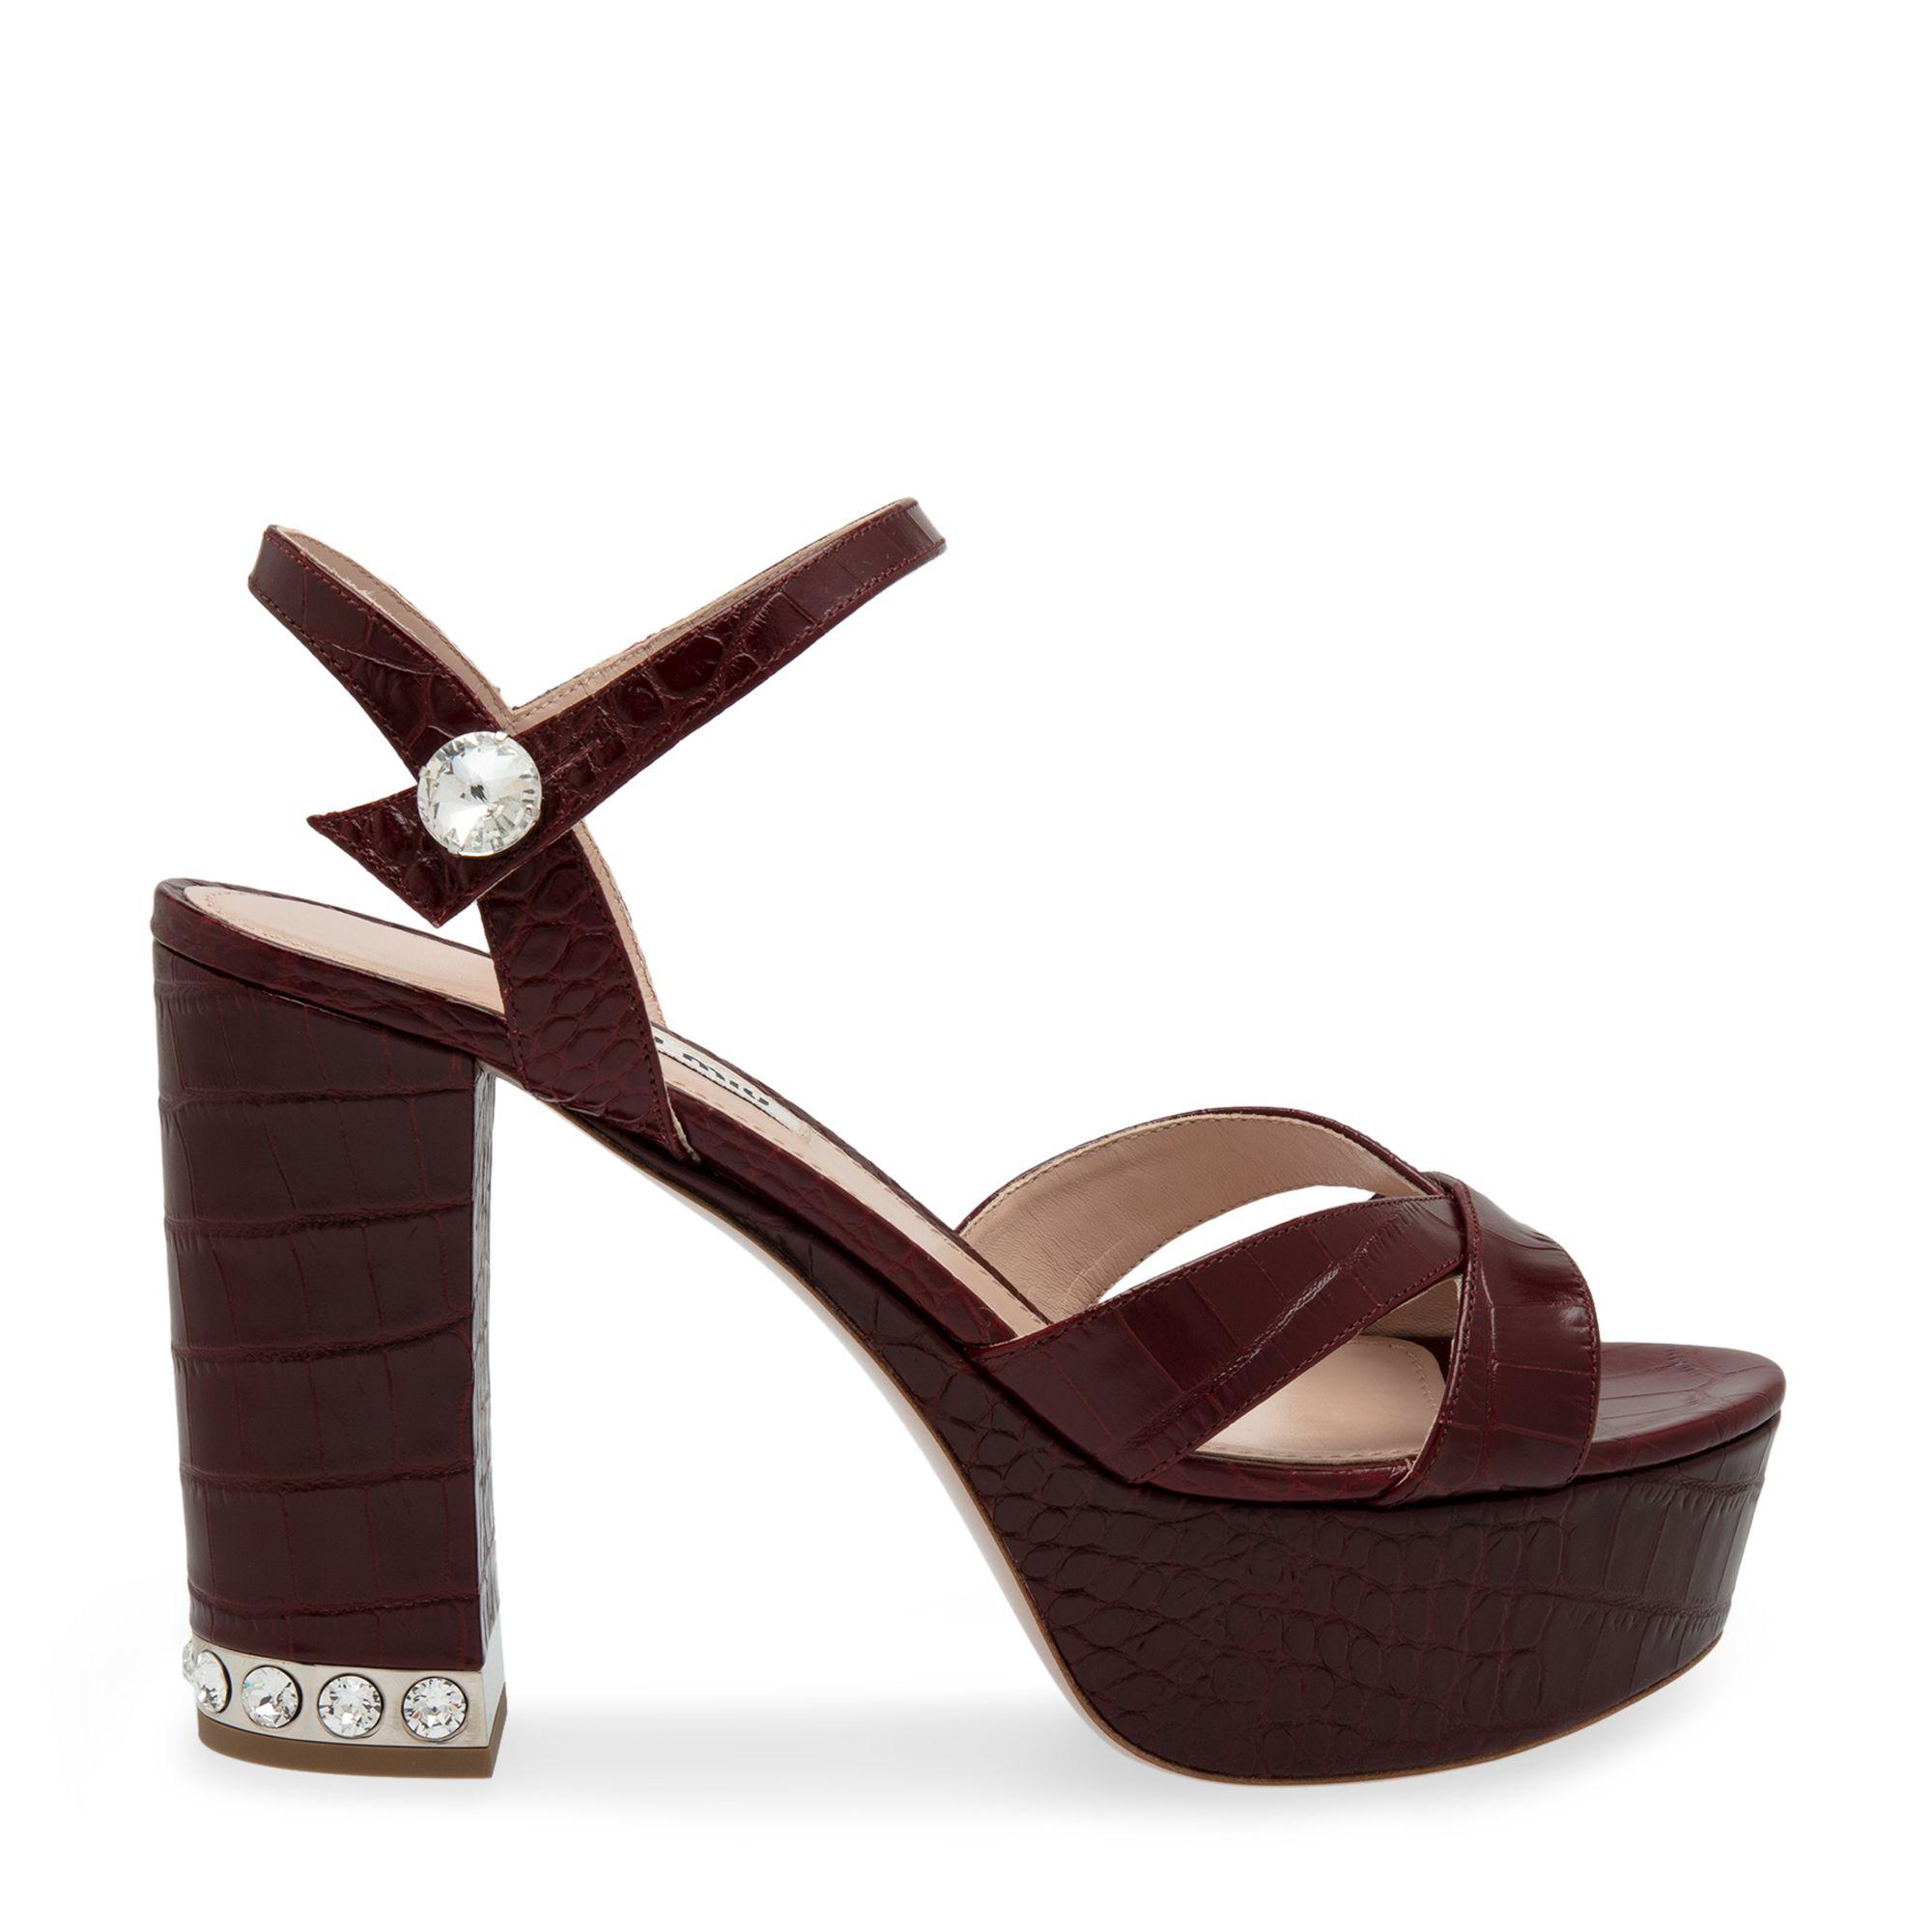 Croc-print platform sandals